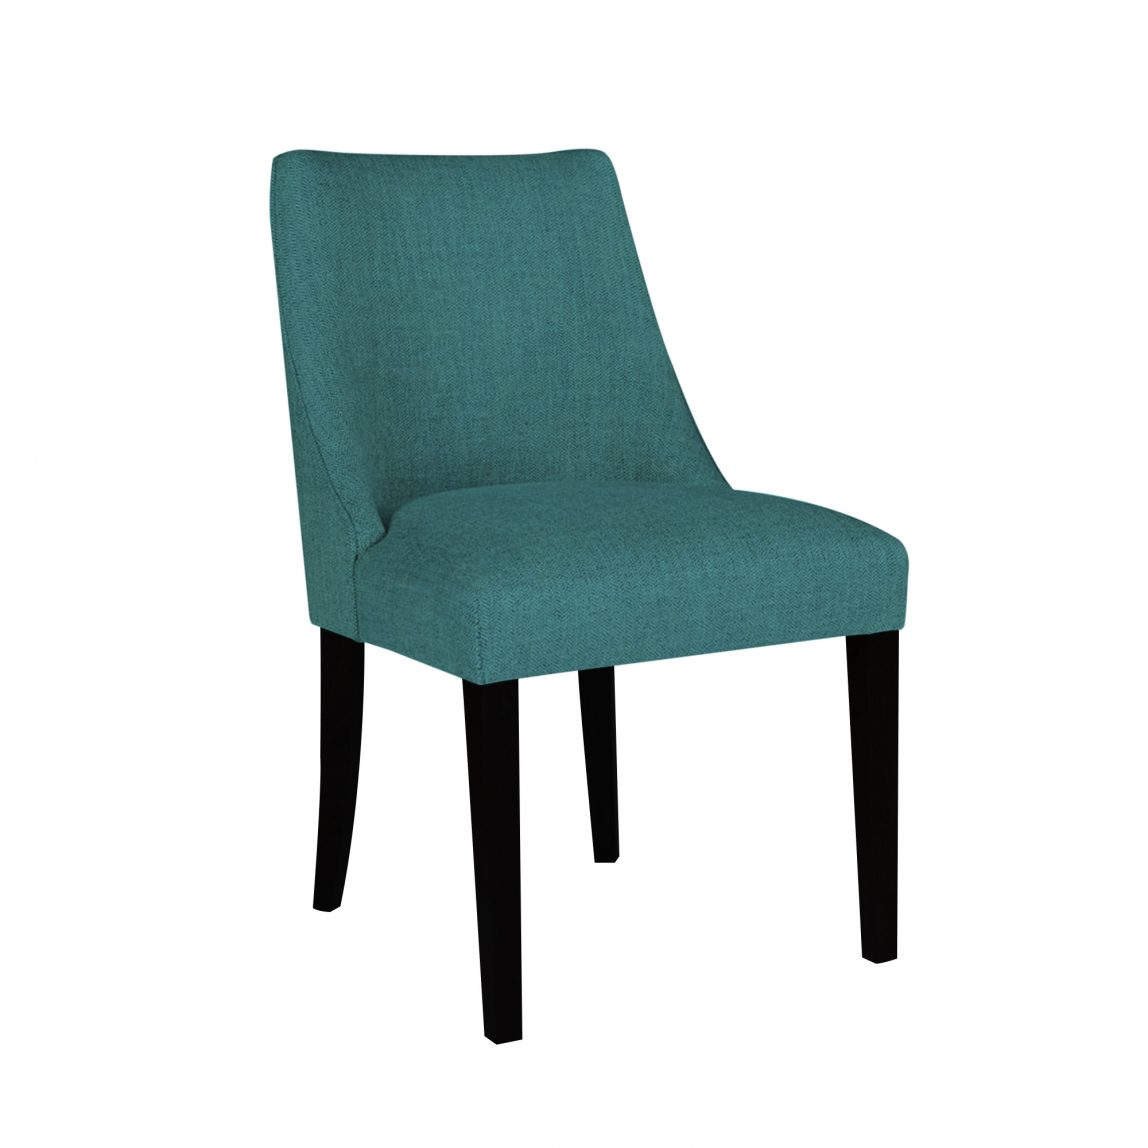 Обеденный стул Дэн